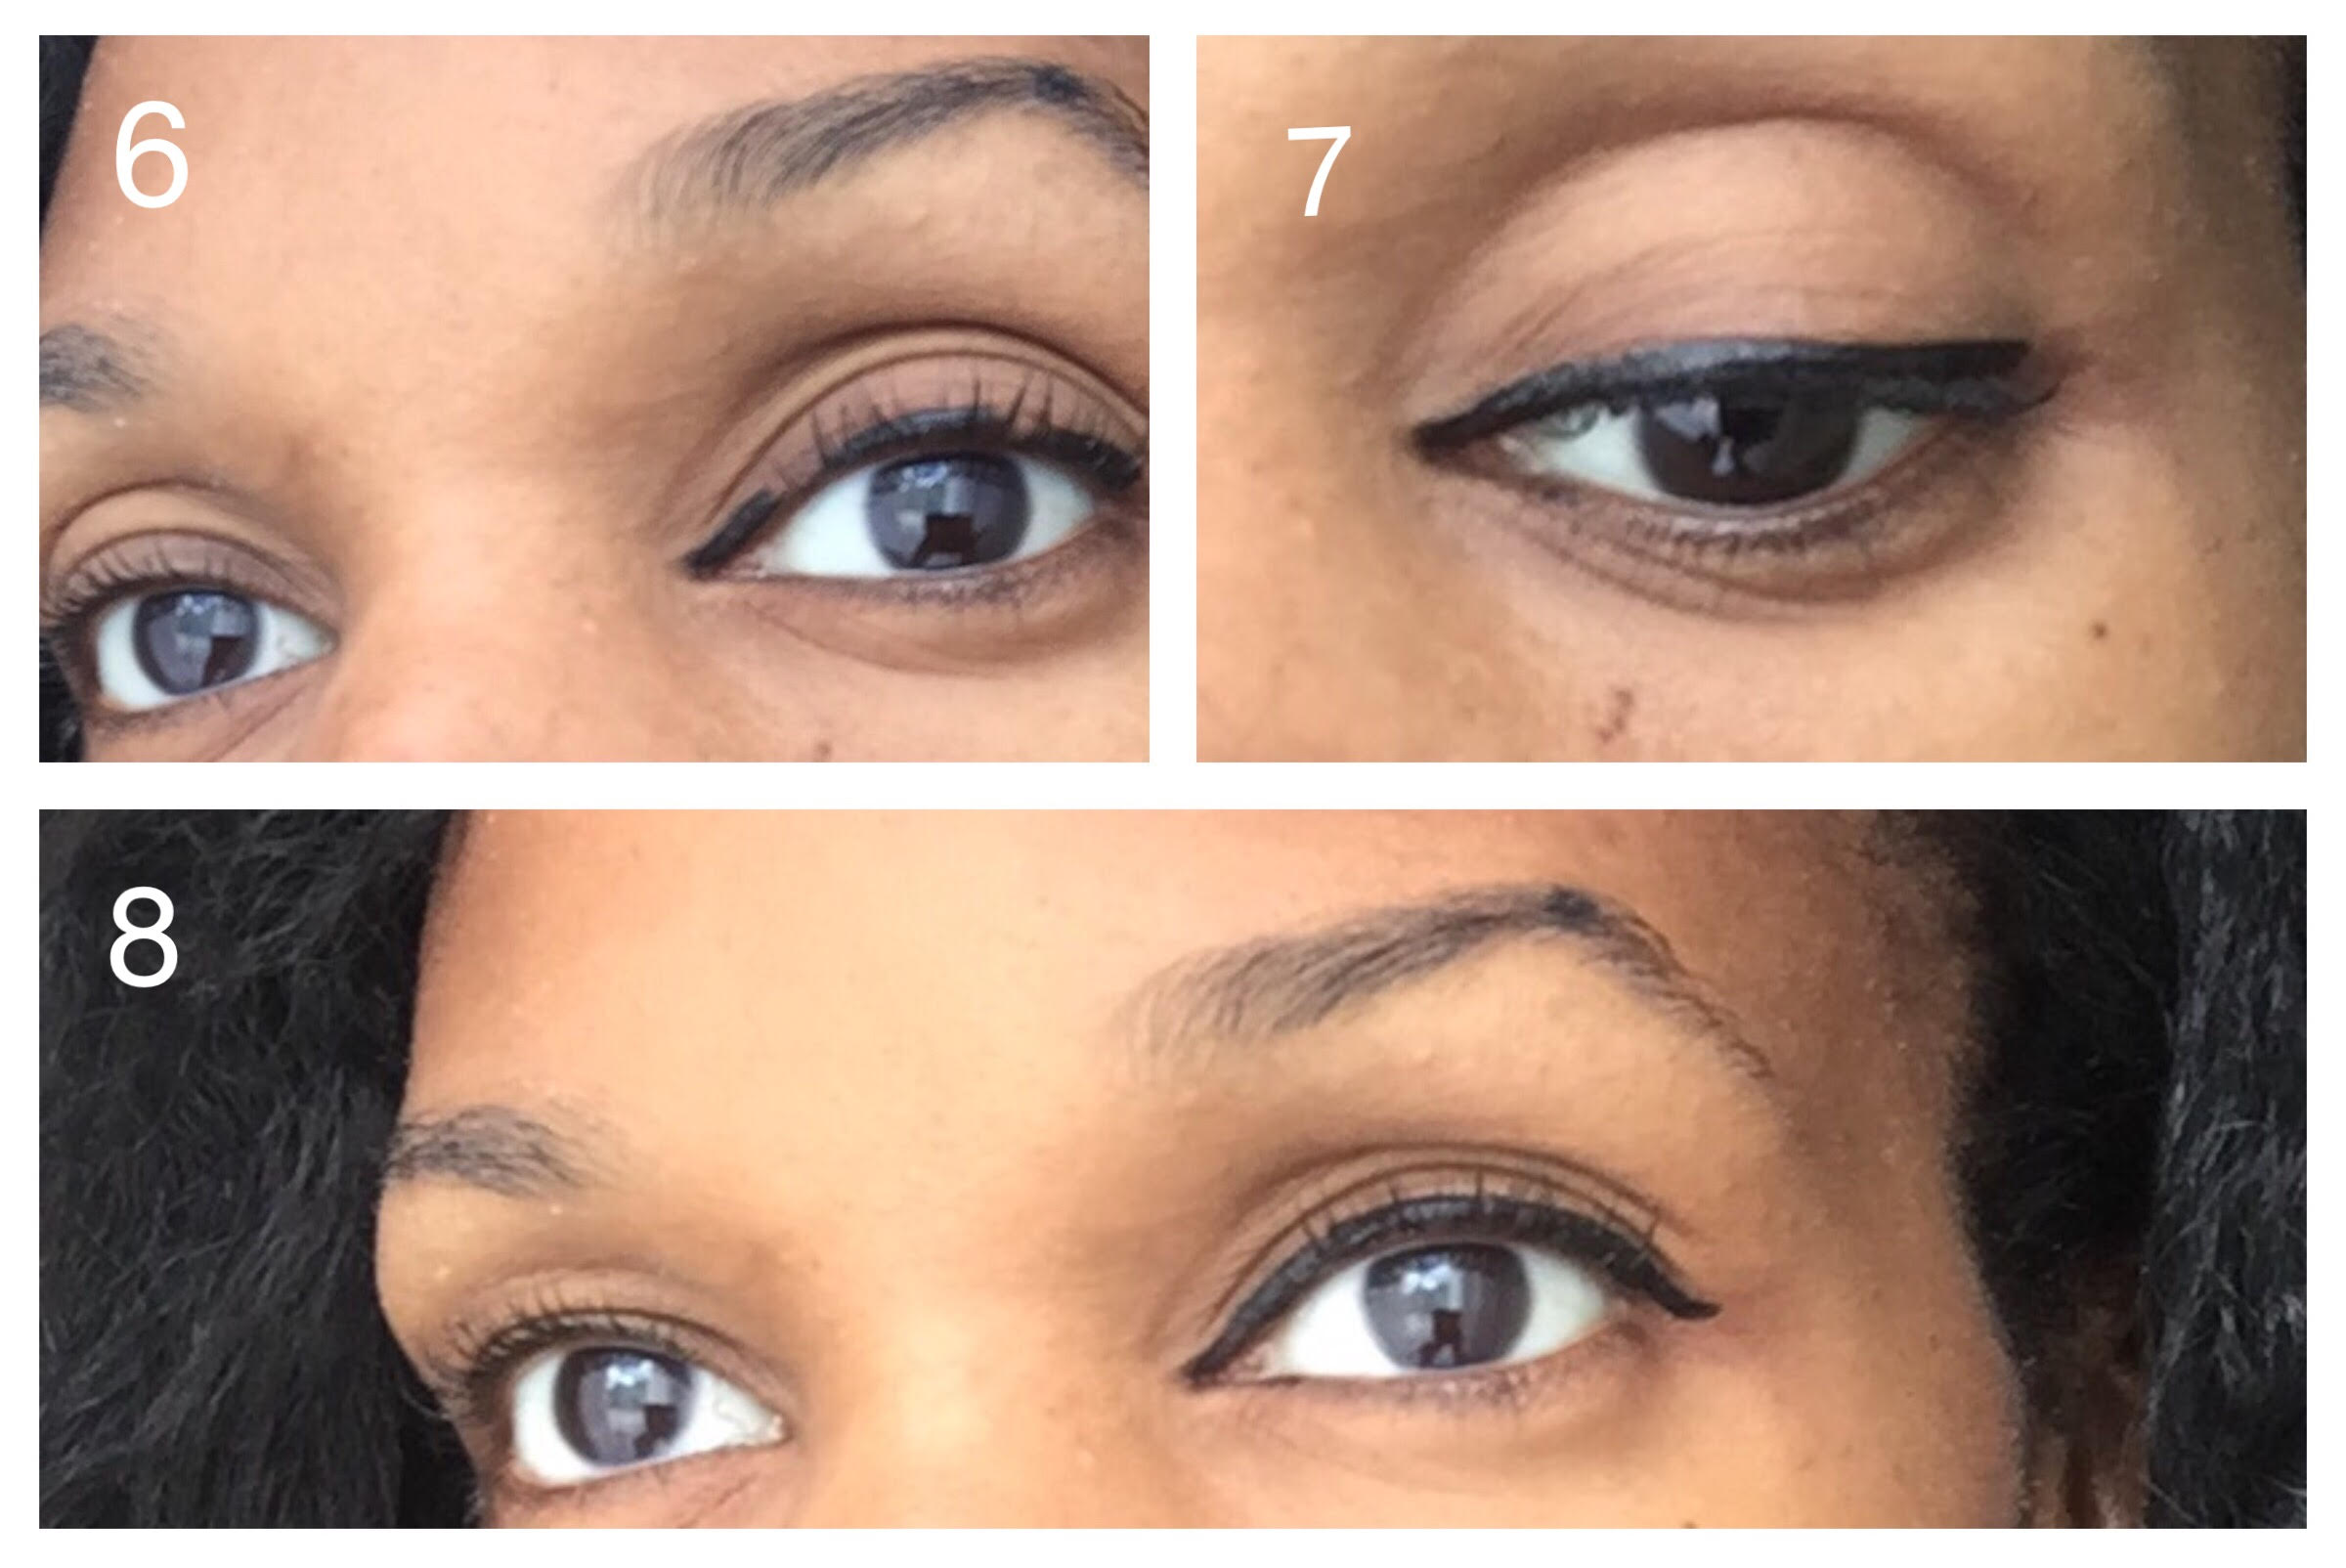 Beaute comment bien mettre son eye liner trendyslemag - Comment mettre eye liner ...